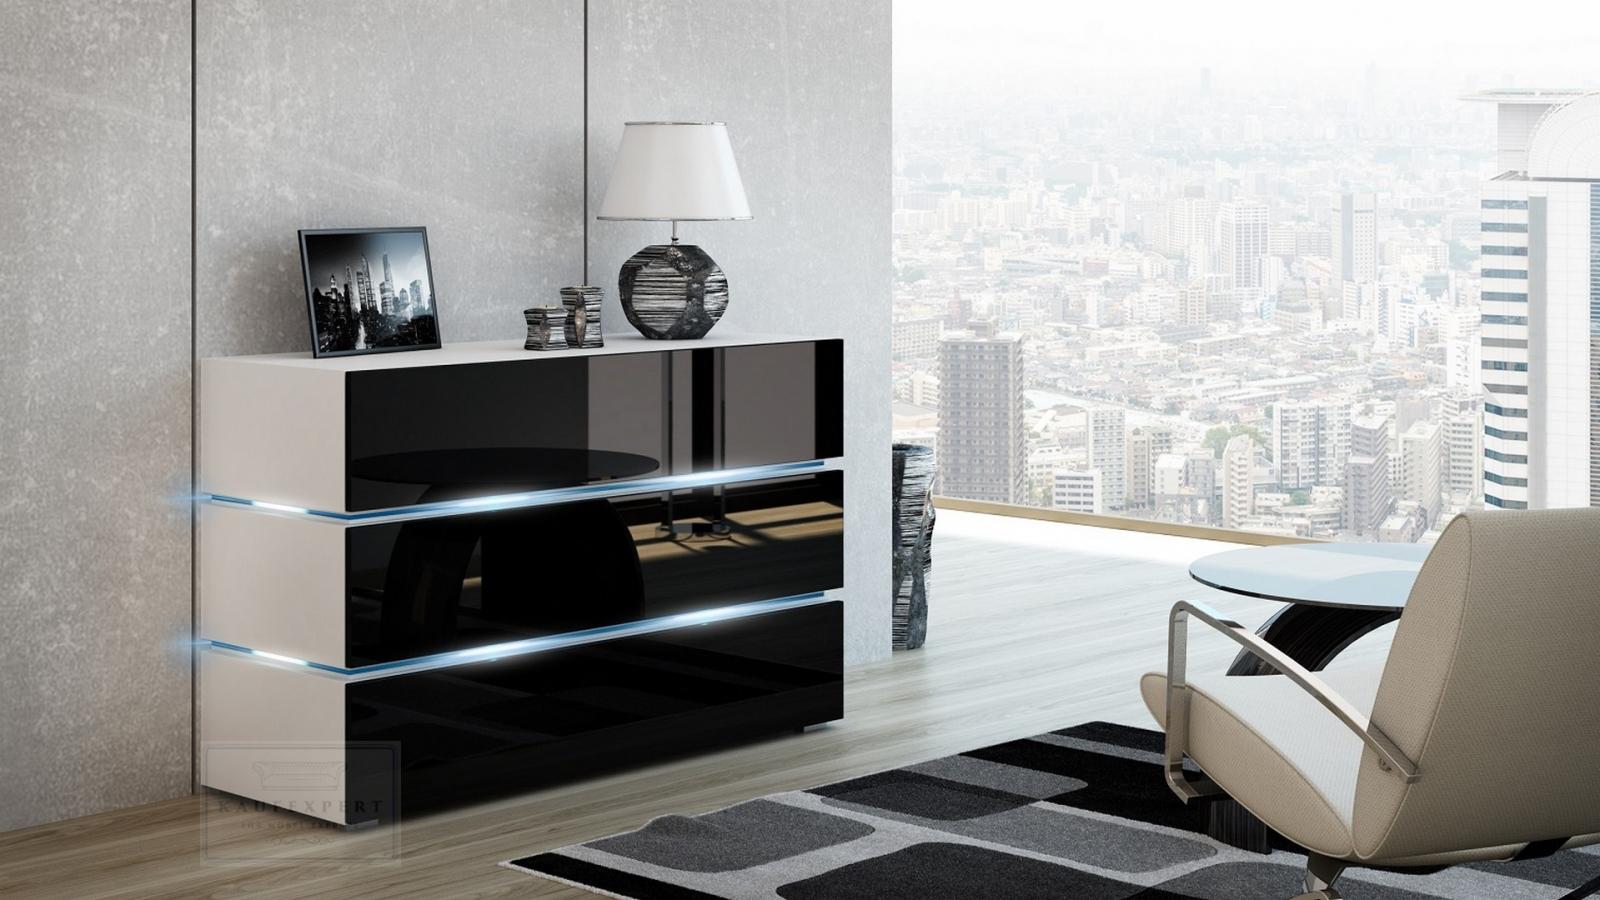 Tv rack modern  KAUFEXPERT - Kommode Shine Sideboard 120 cm Schwarz Hochglanz/Weiß ...